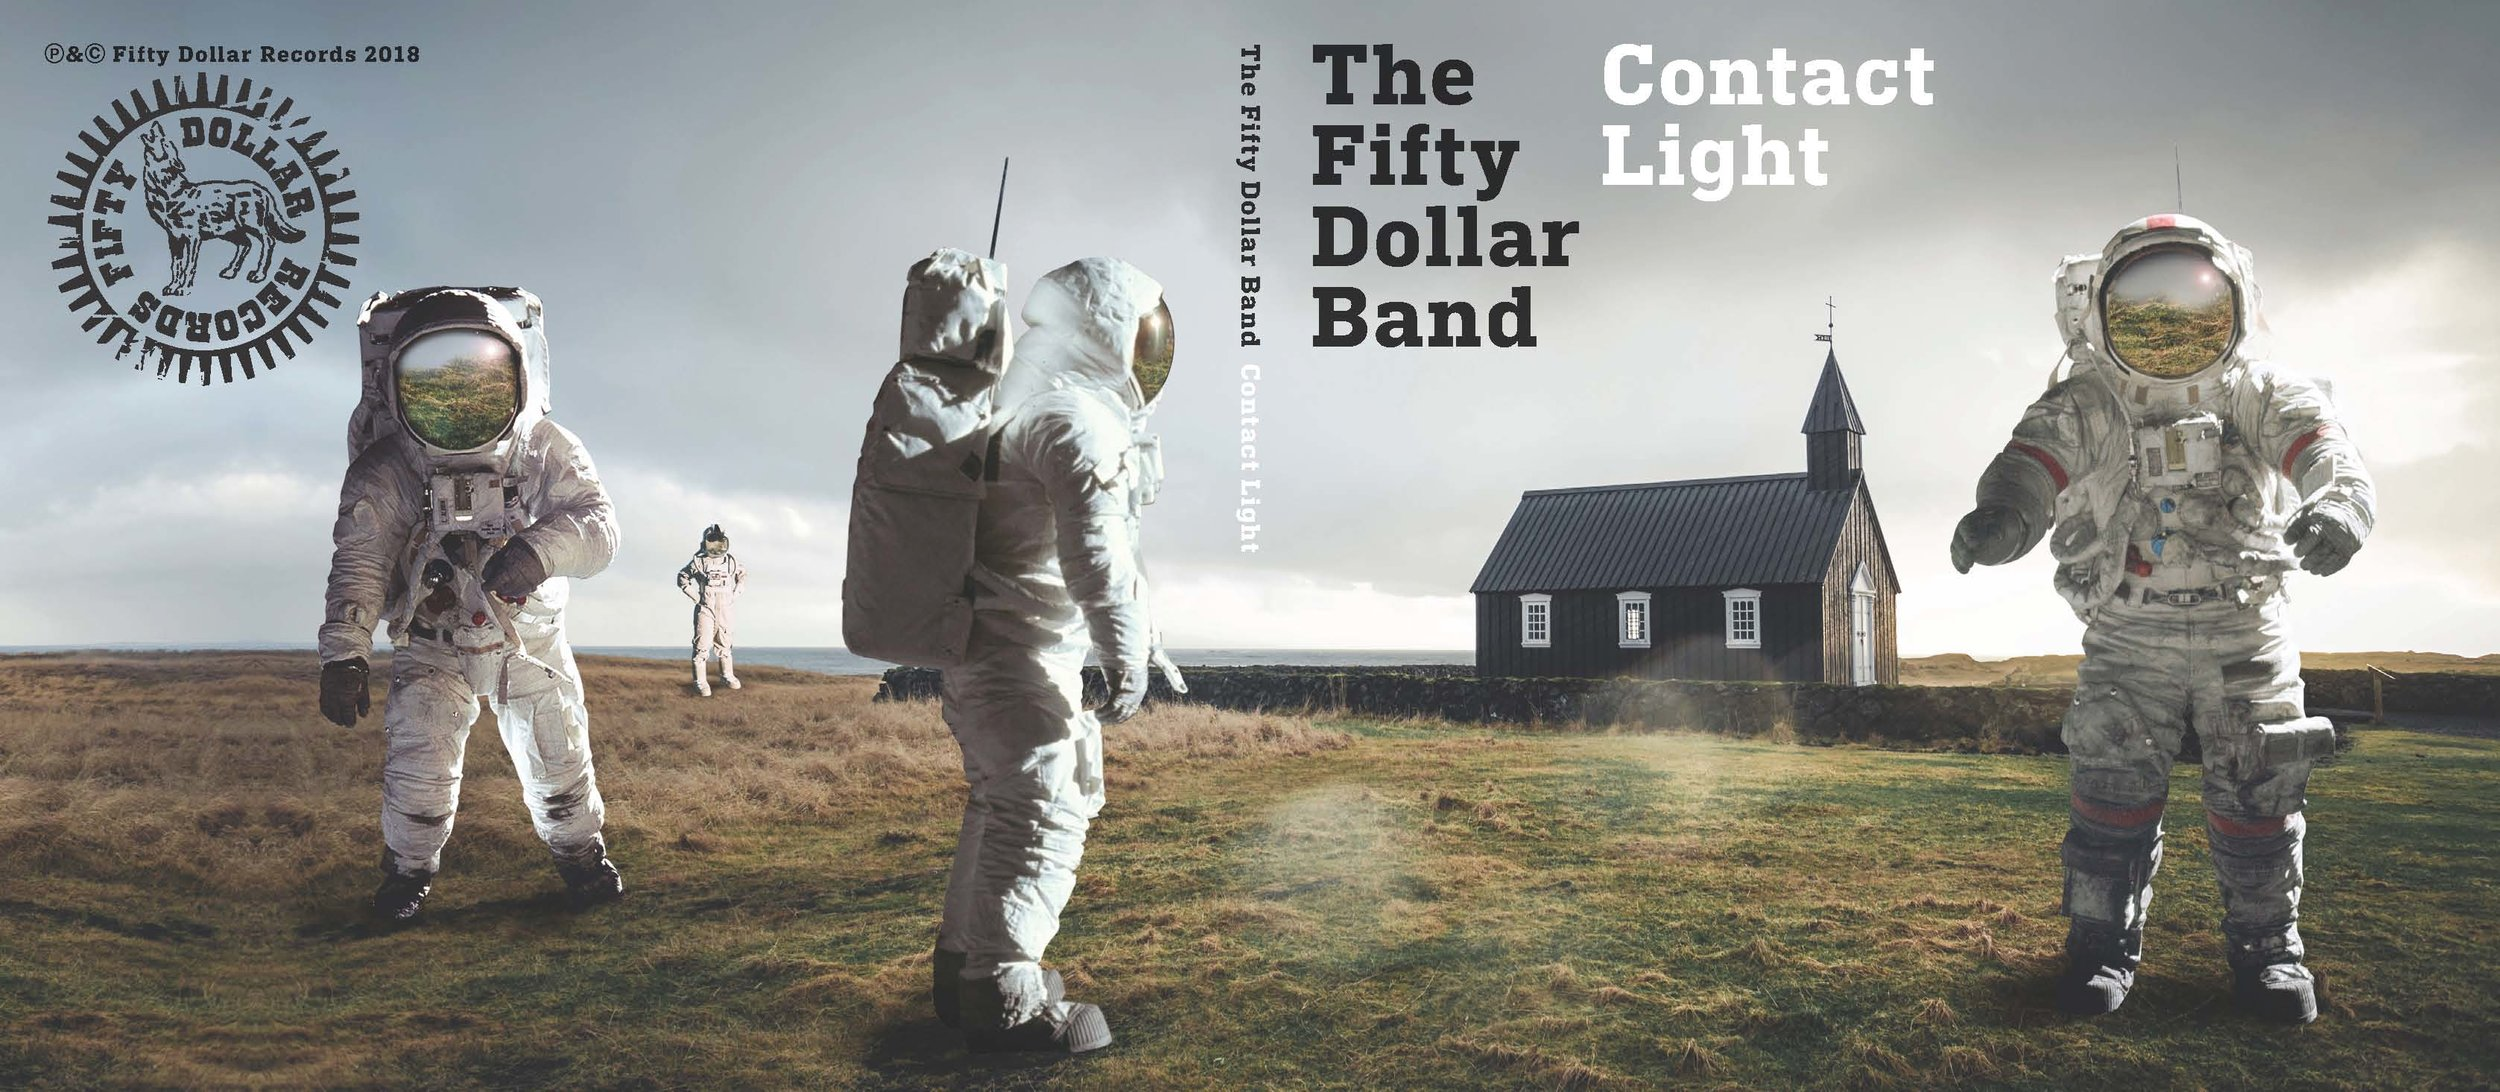 The Fifty Dollar Band_Contact Light_Artwork.JPG